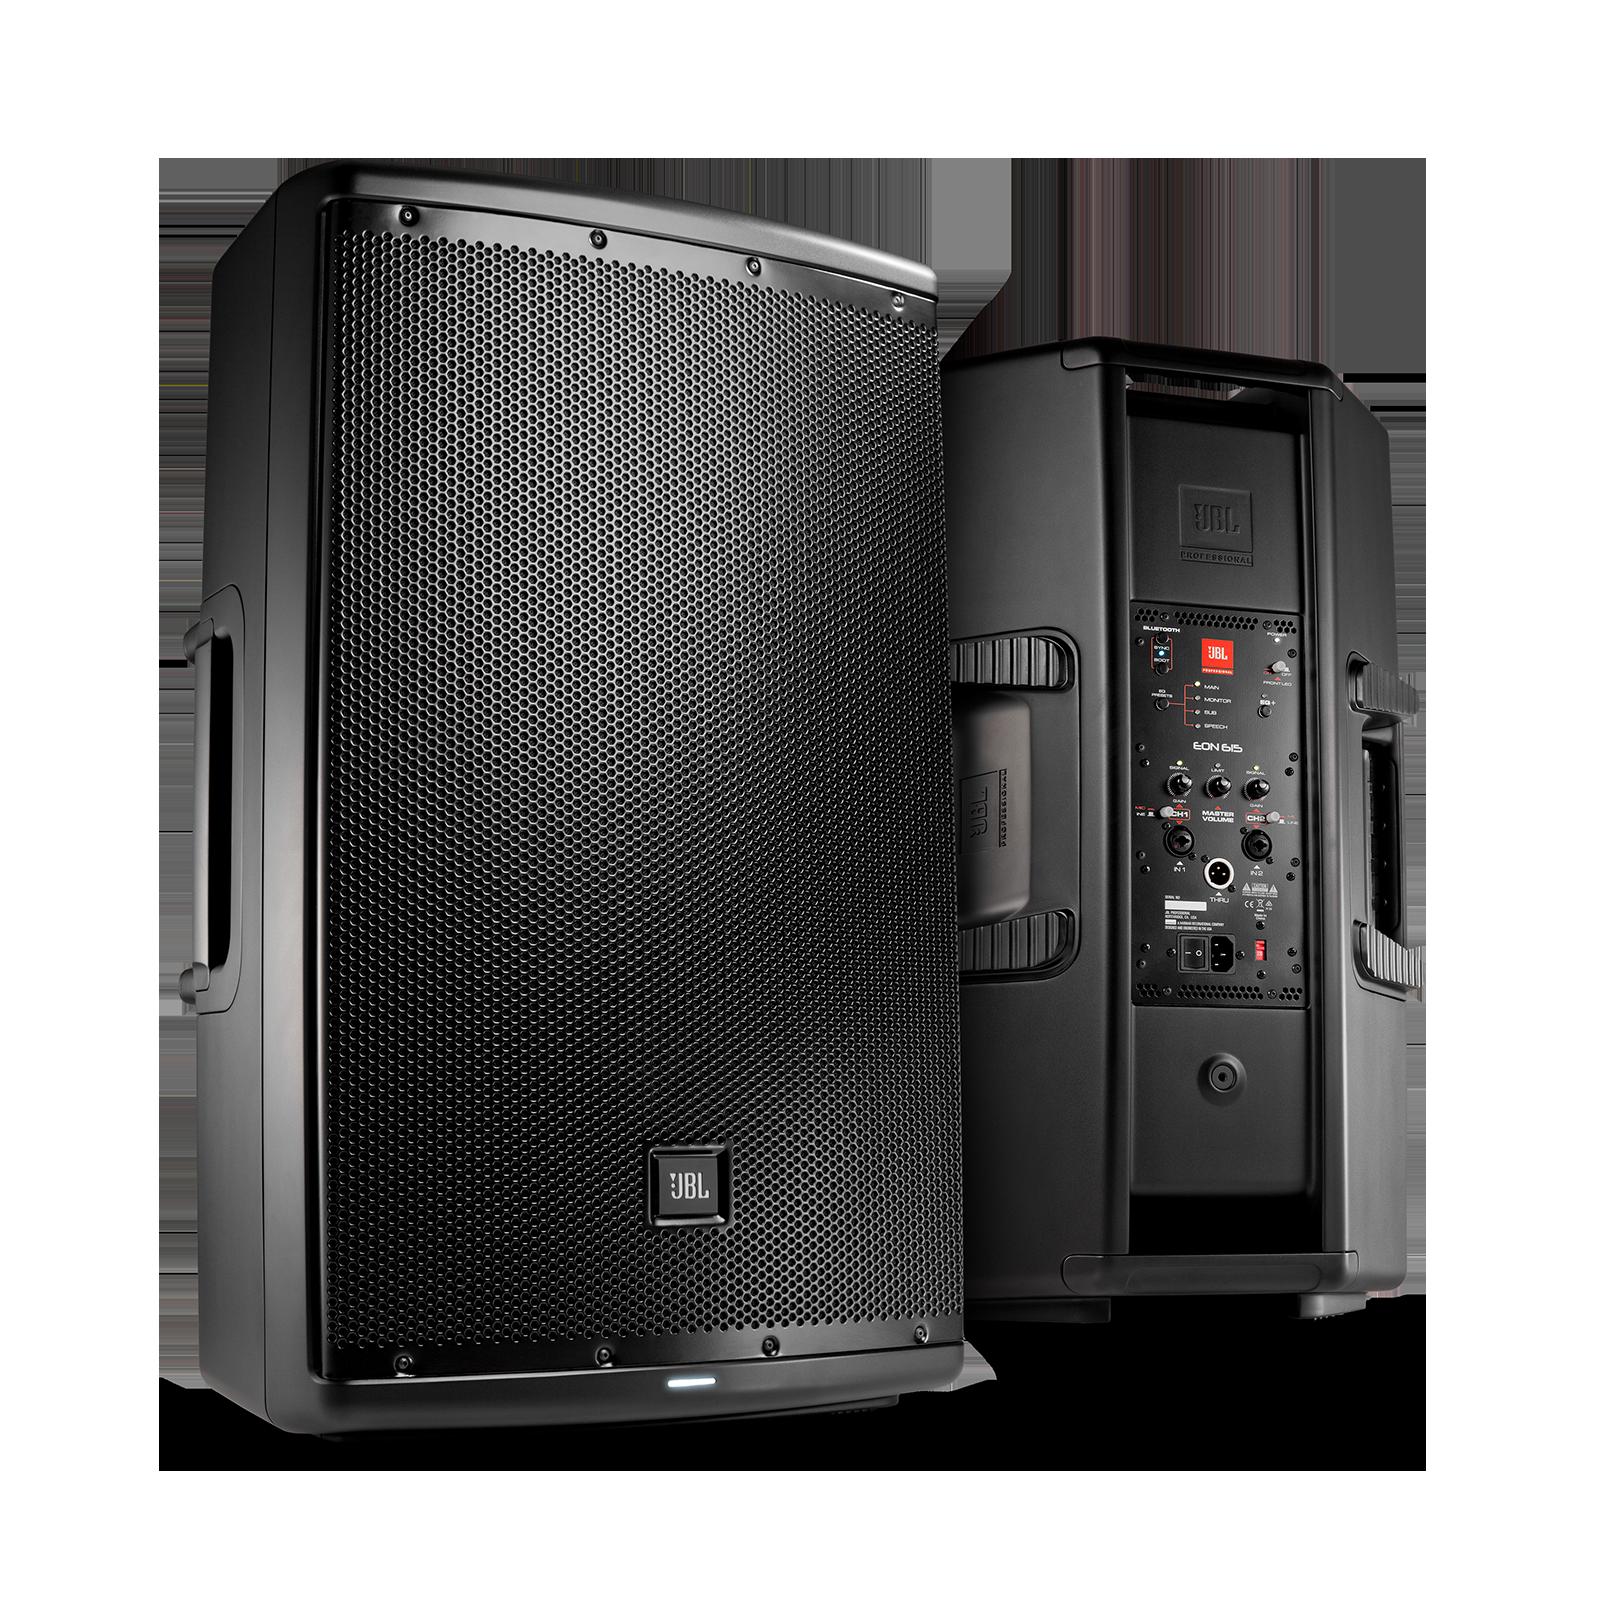 "JBL EON615 - Black - 15"" Two-Way Multipurpose Self-Powered Sound Reinforcement - Hero"